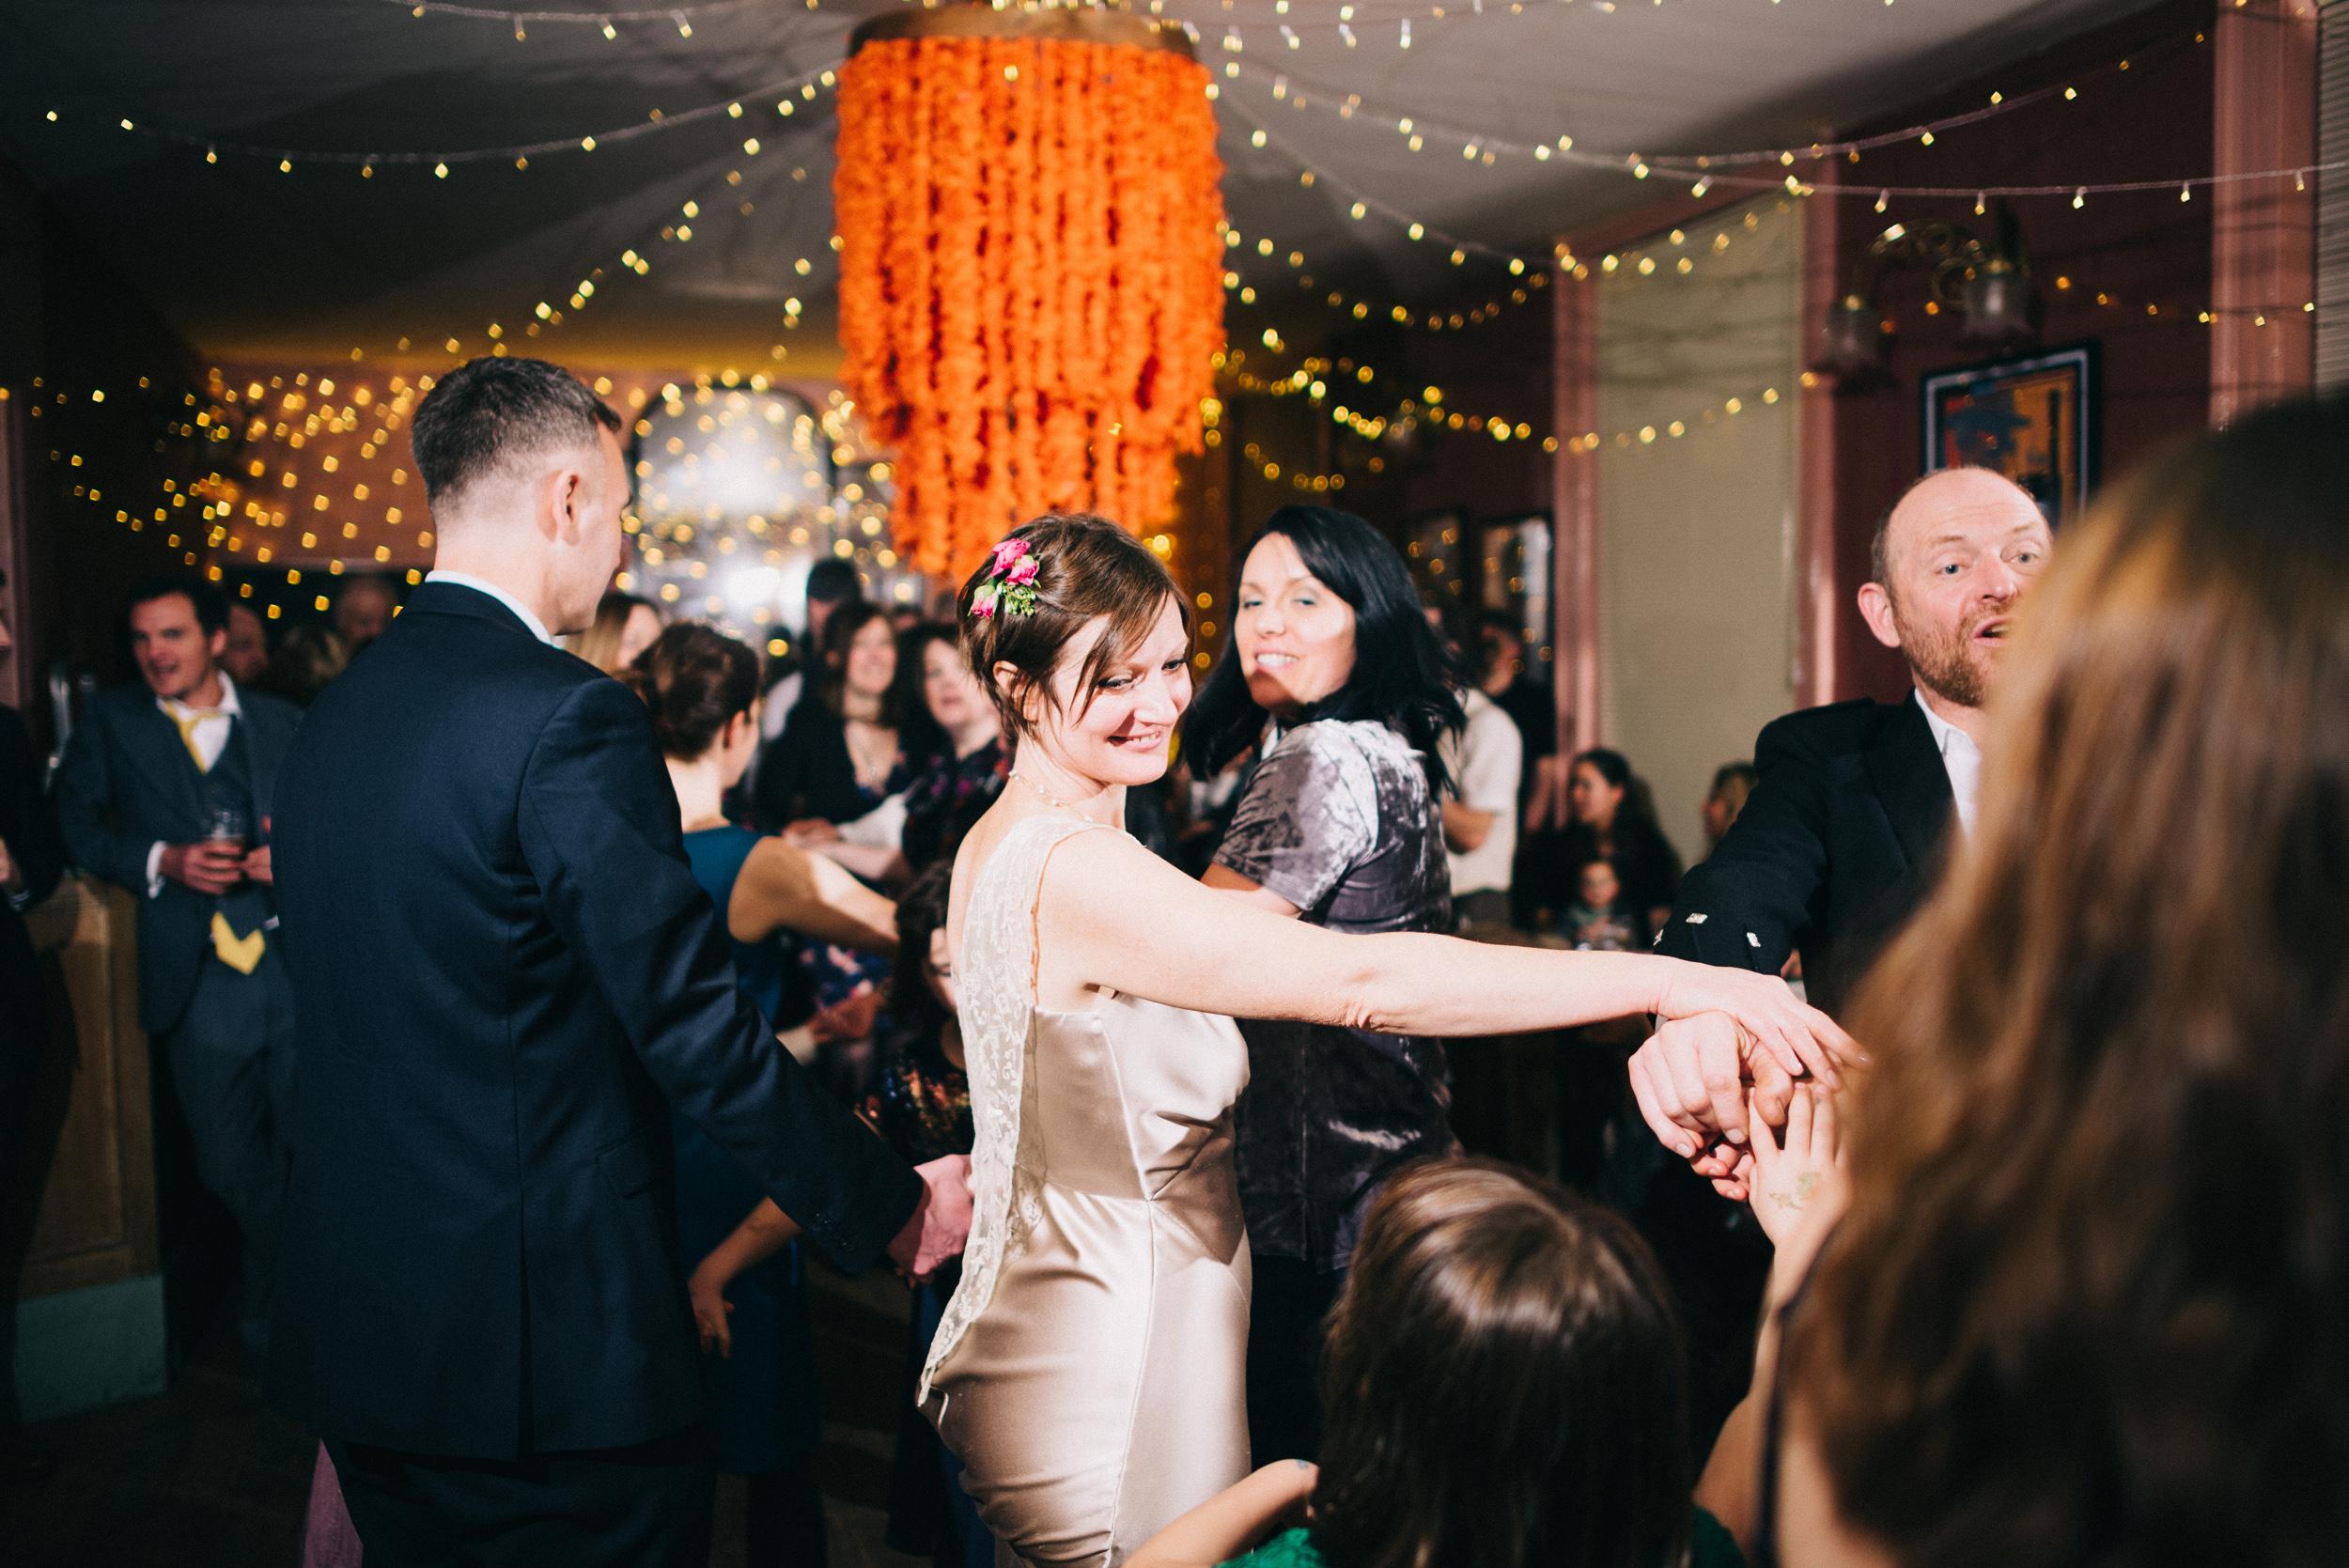 Alice-Bias-Cut-Silk-Wedding-Dress-Kate-Beaumont-Sheffield-Botanical-Gardens-by-Peakography-26.jpg